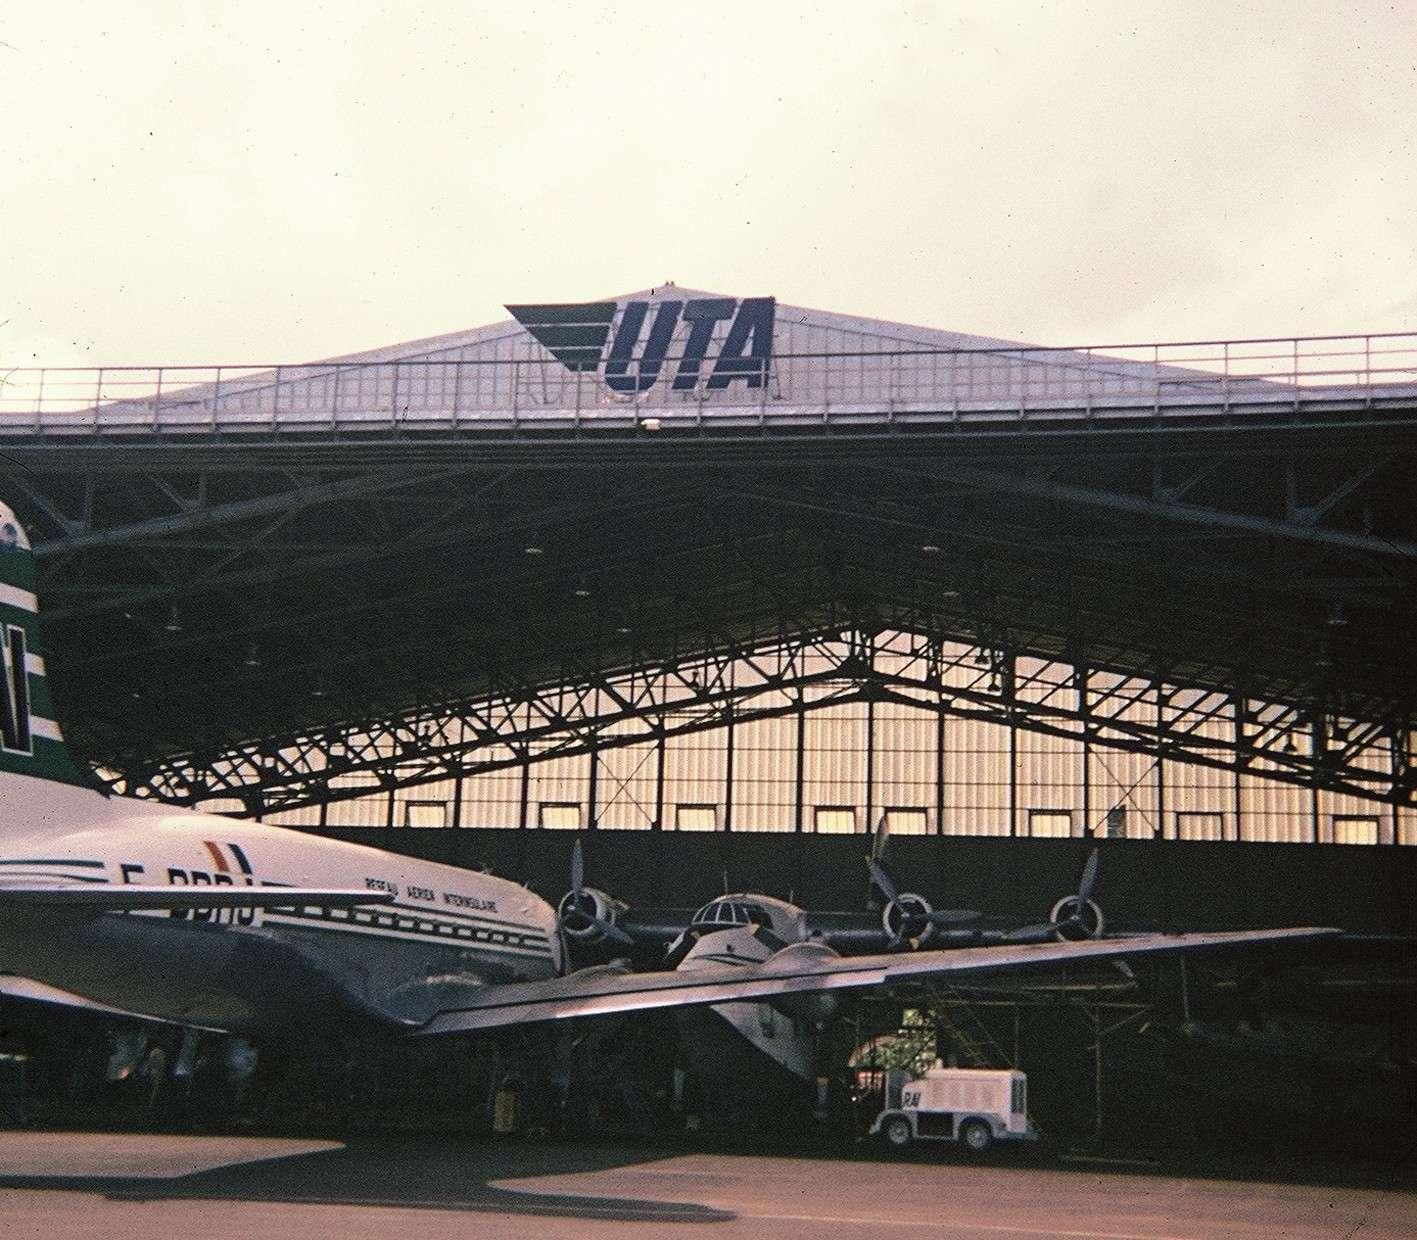 Tahiti] Aéroport Faa'a  durant les campagnes. Cd2_pa25